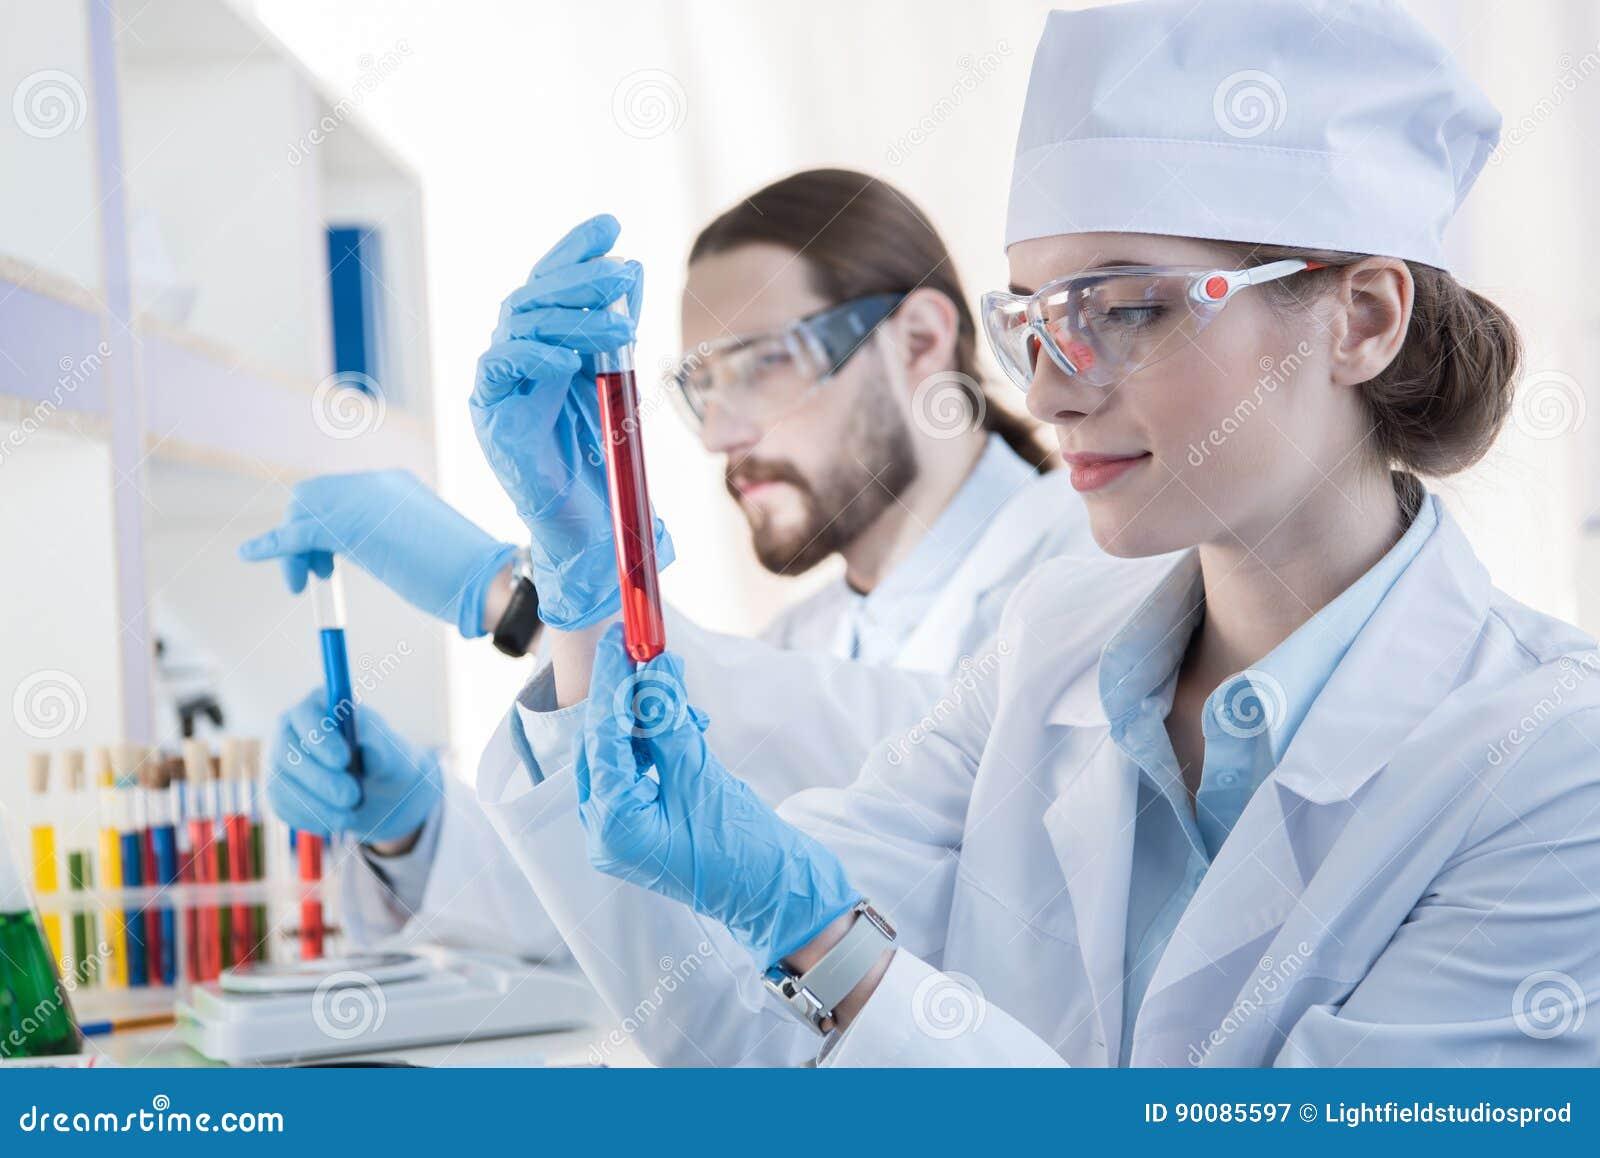 Chemists making experiment